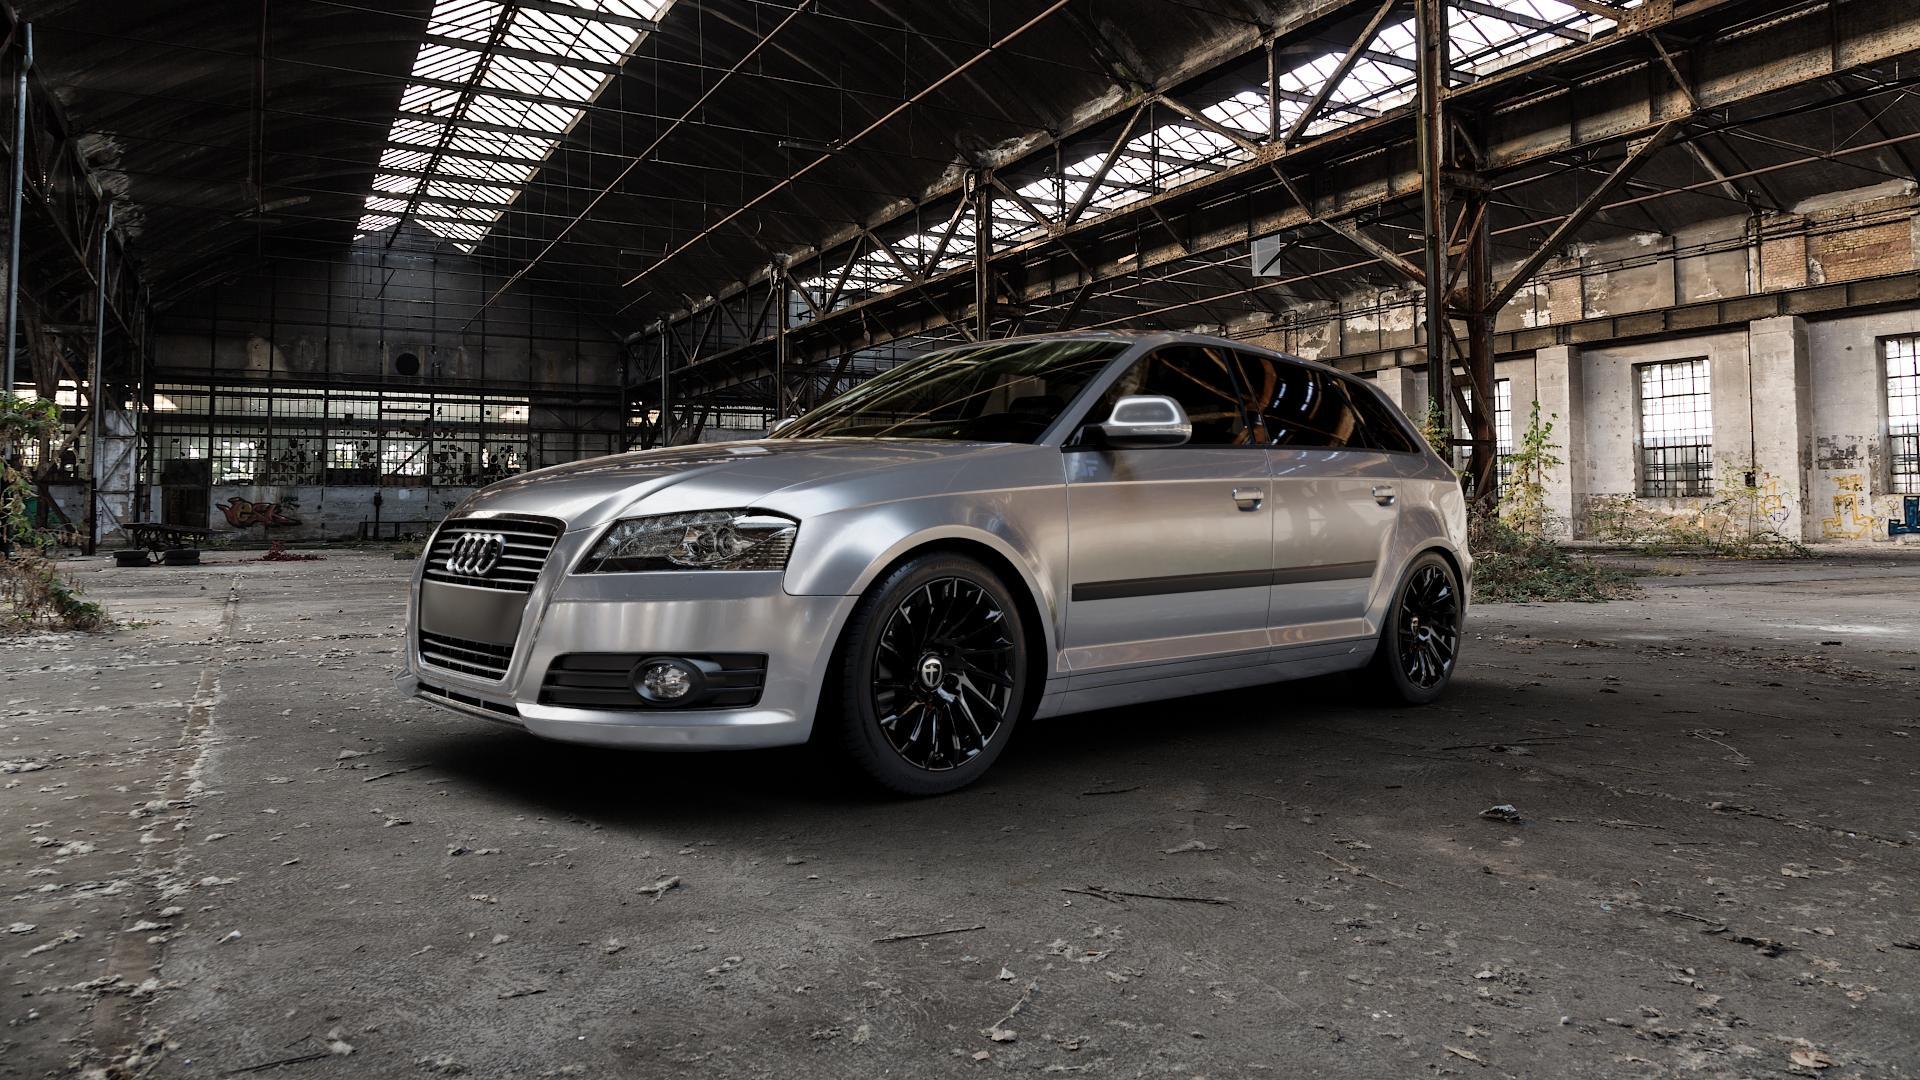 TOMASON TN16 Black painted Felge mit Reifen schwarz in 17Zoll Winterfelge Alufelge auf silbernem Audi A3 Typ 8P (Sportback) 1,6l 75kW (102 PS) 2,0l FSI 110kW (150 1,9l TDI 77kW (105 103kW (140 TFSI 147kW (200 85kW (116 100kW (136 1,8l 118kW (160 125kW (170 1,4l 92kW (125 120kW (163 quattro 3,2l V6 184kW (250 S3 195kW (265 1,2l 66kW (90